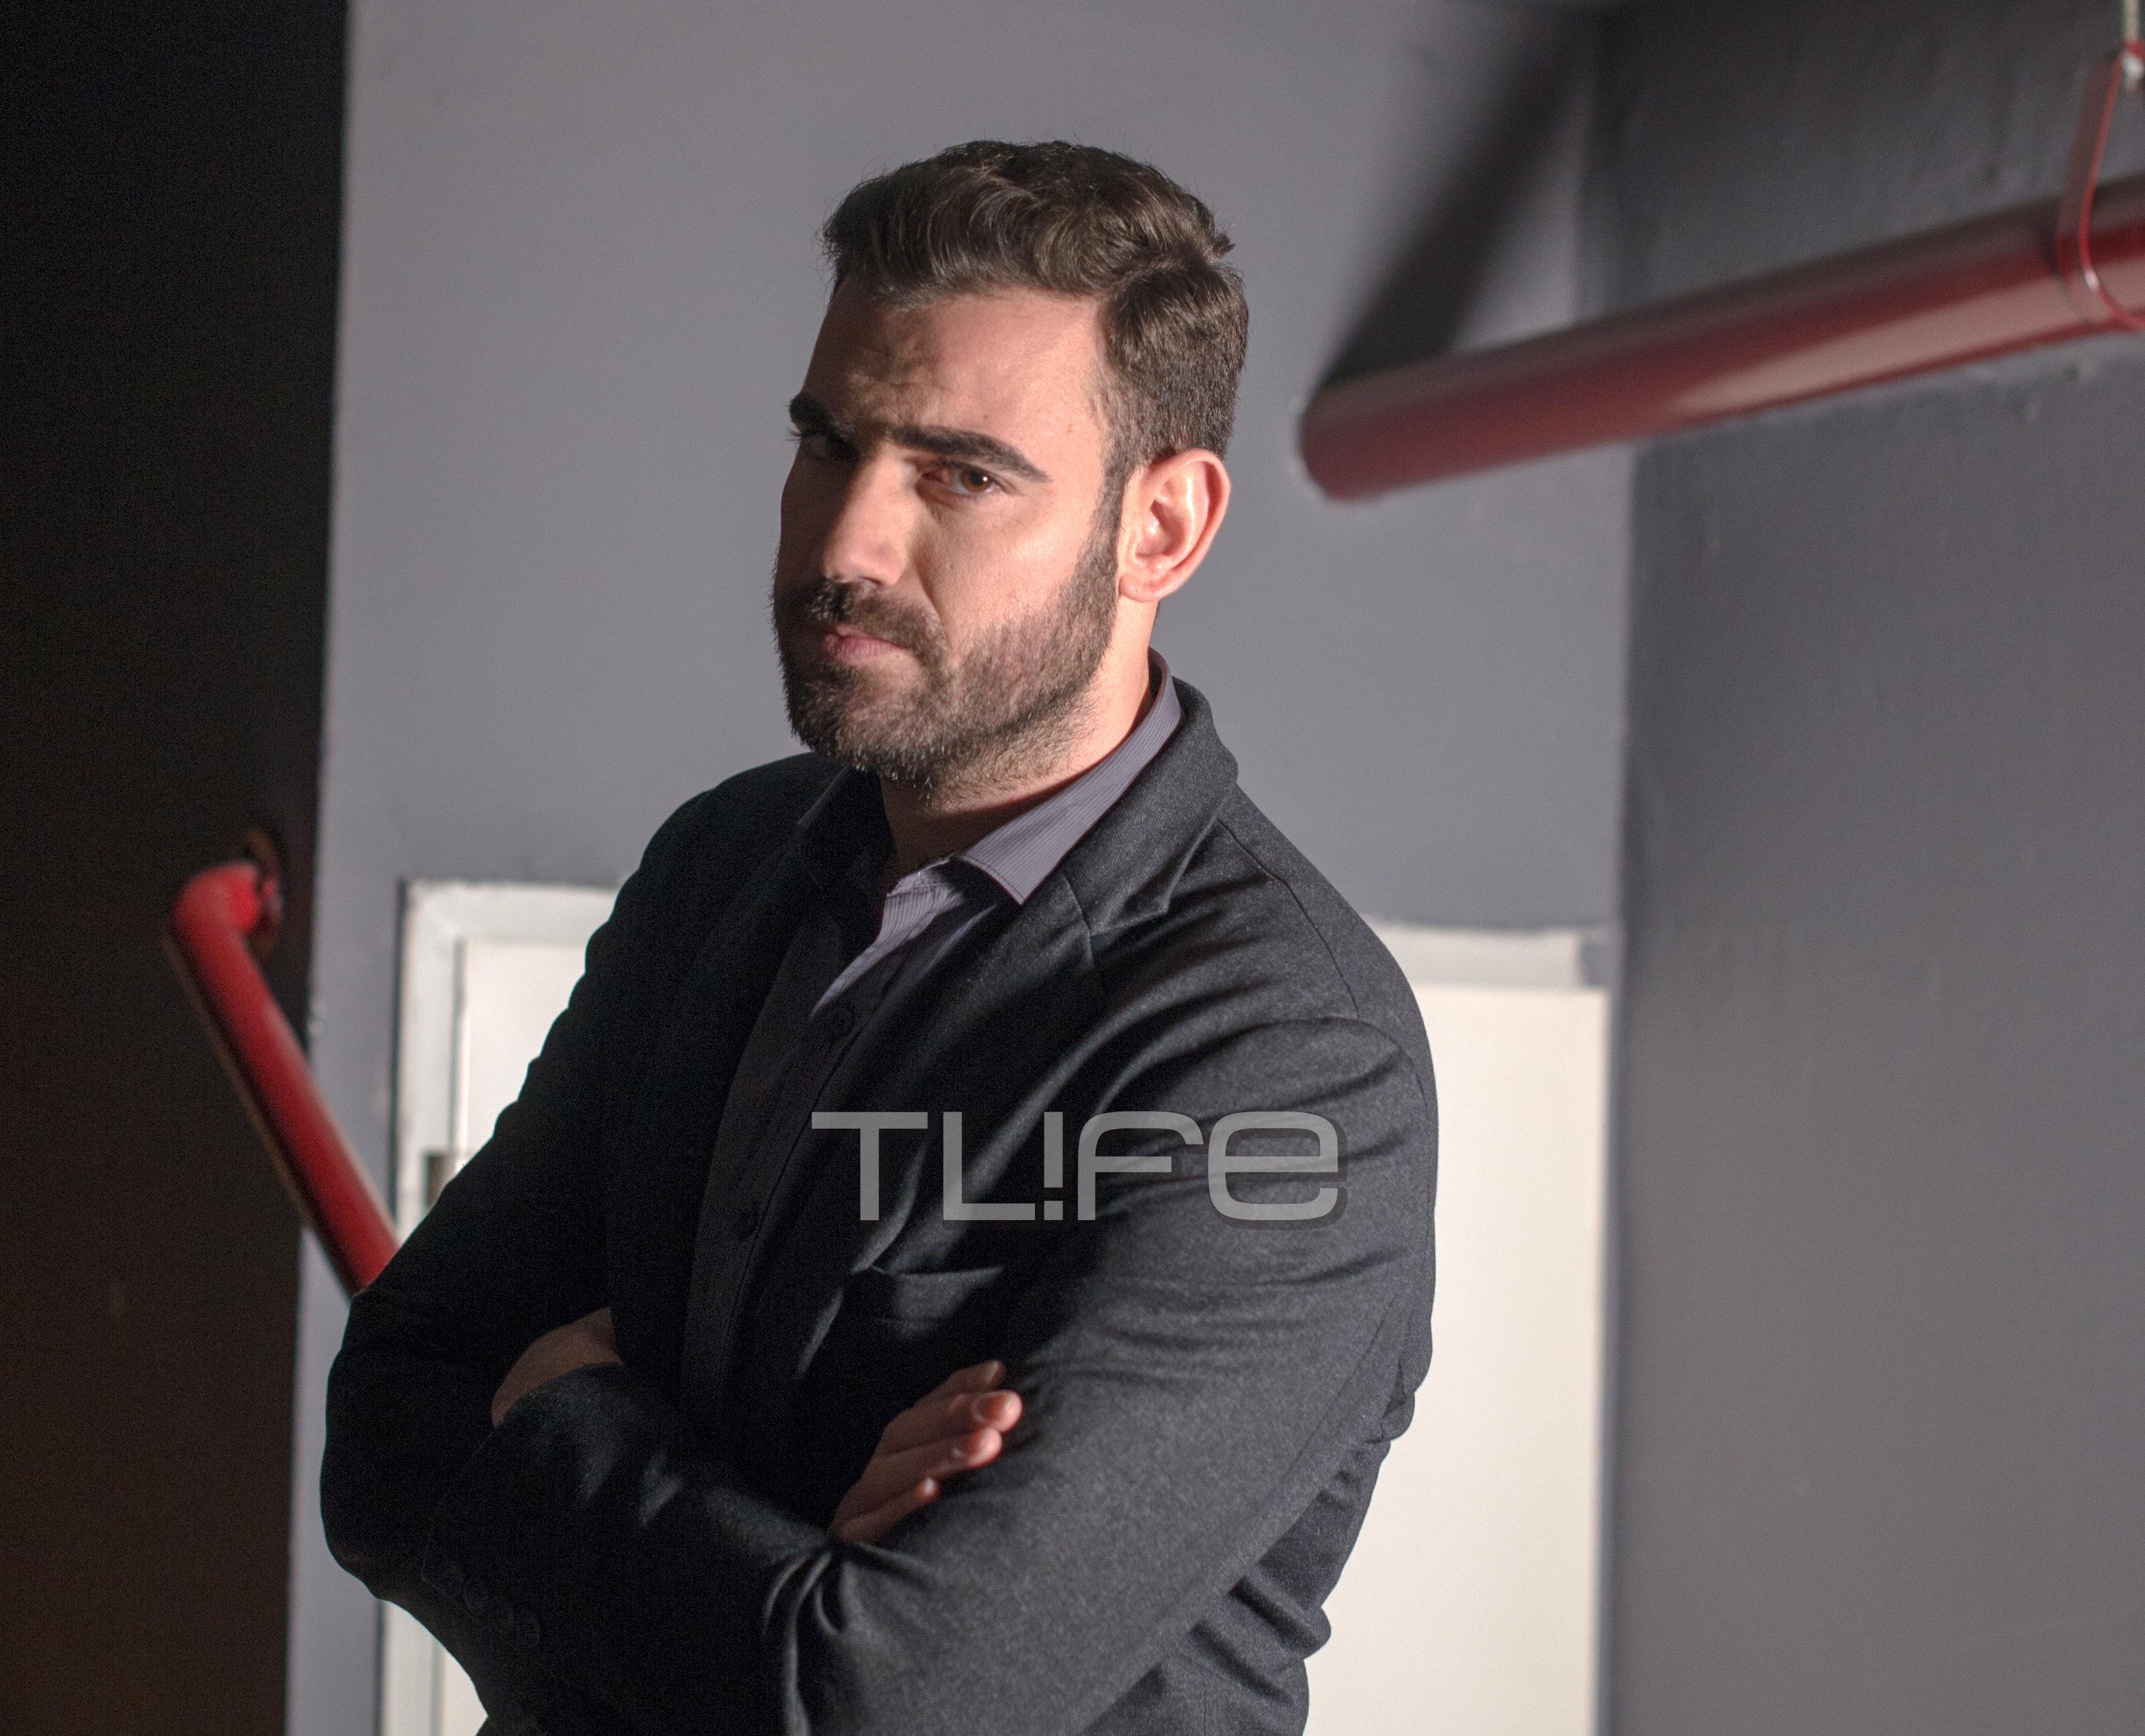 Nίκος Πολυδερόπουλος: Σήκωσε δέντρο που έπεσε στο δρόμο πάνω σε ταξί! BINTEO